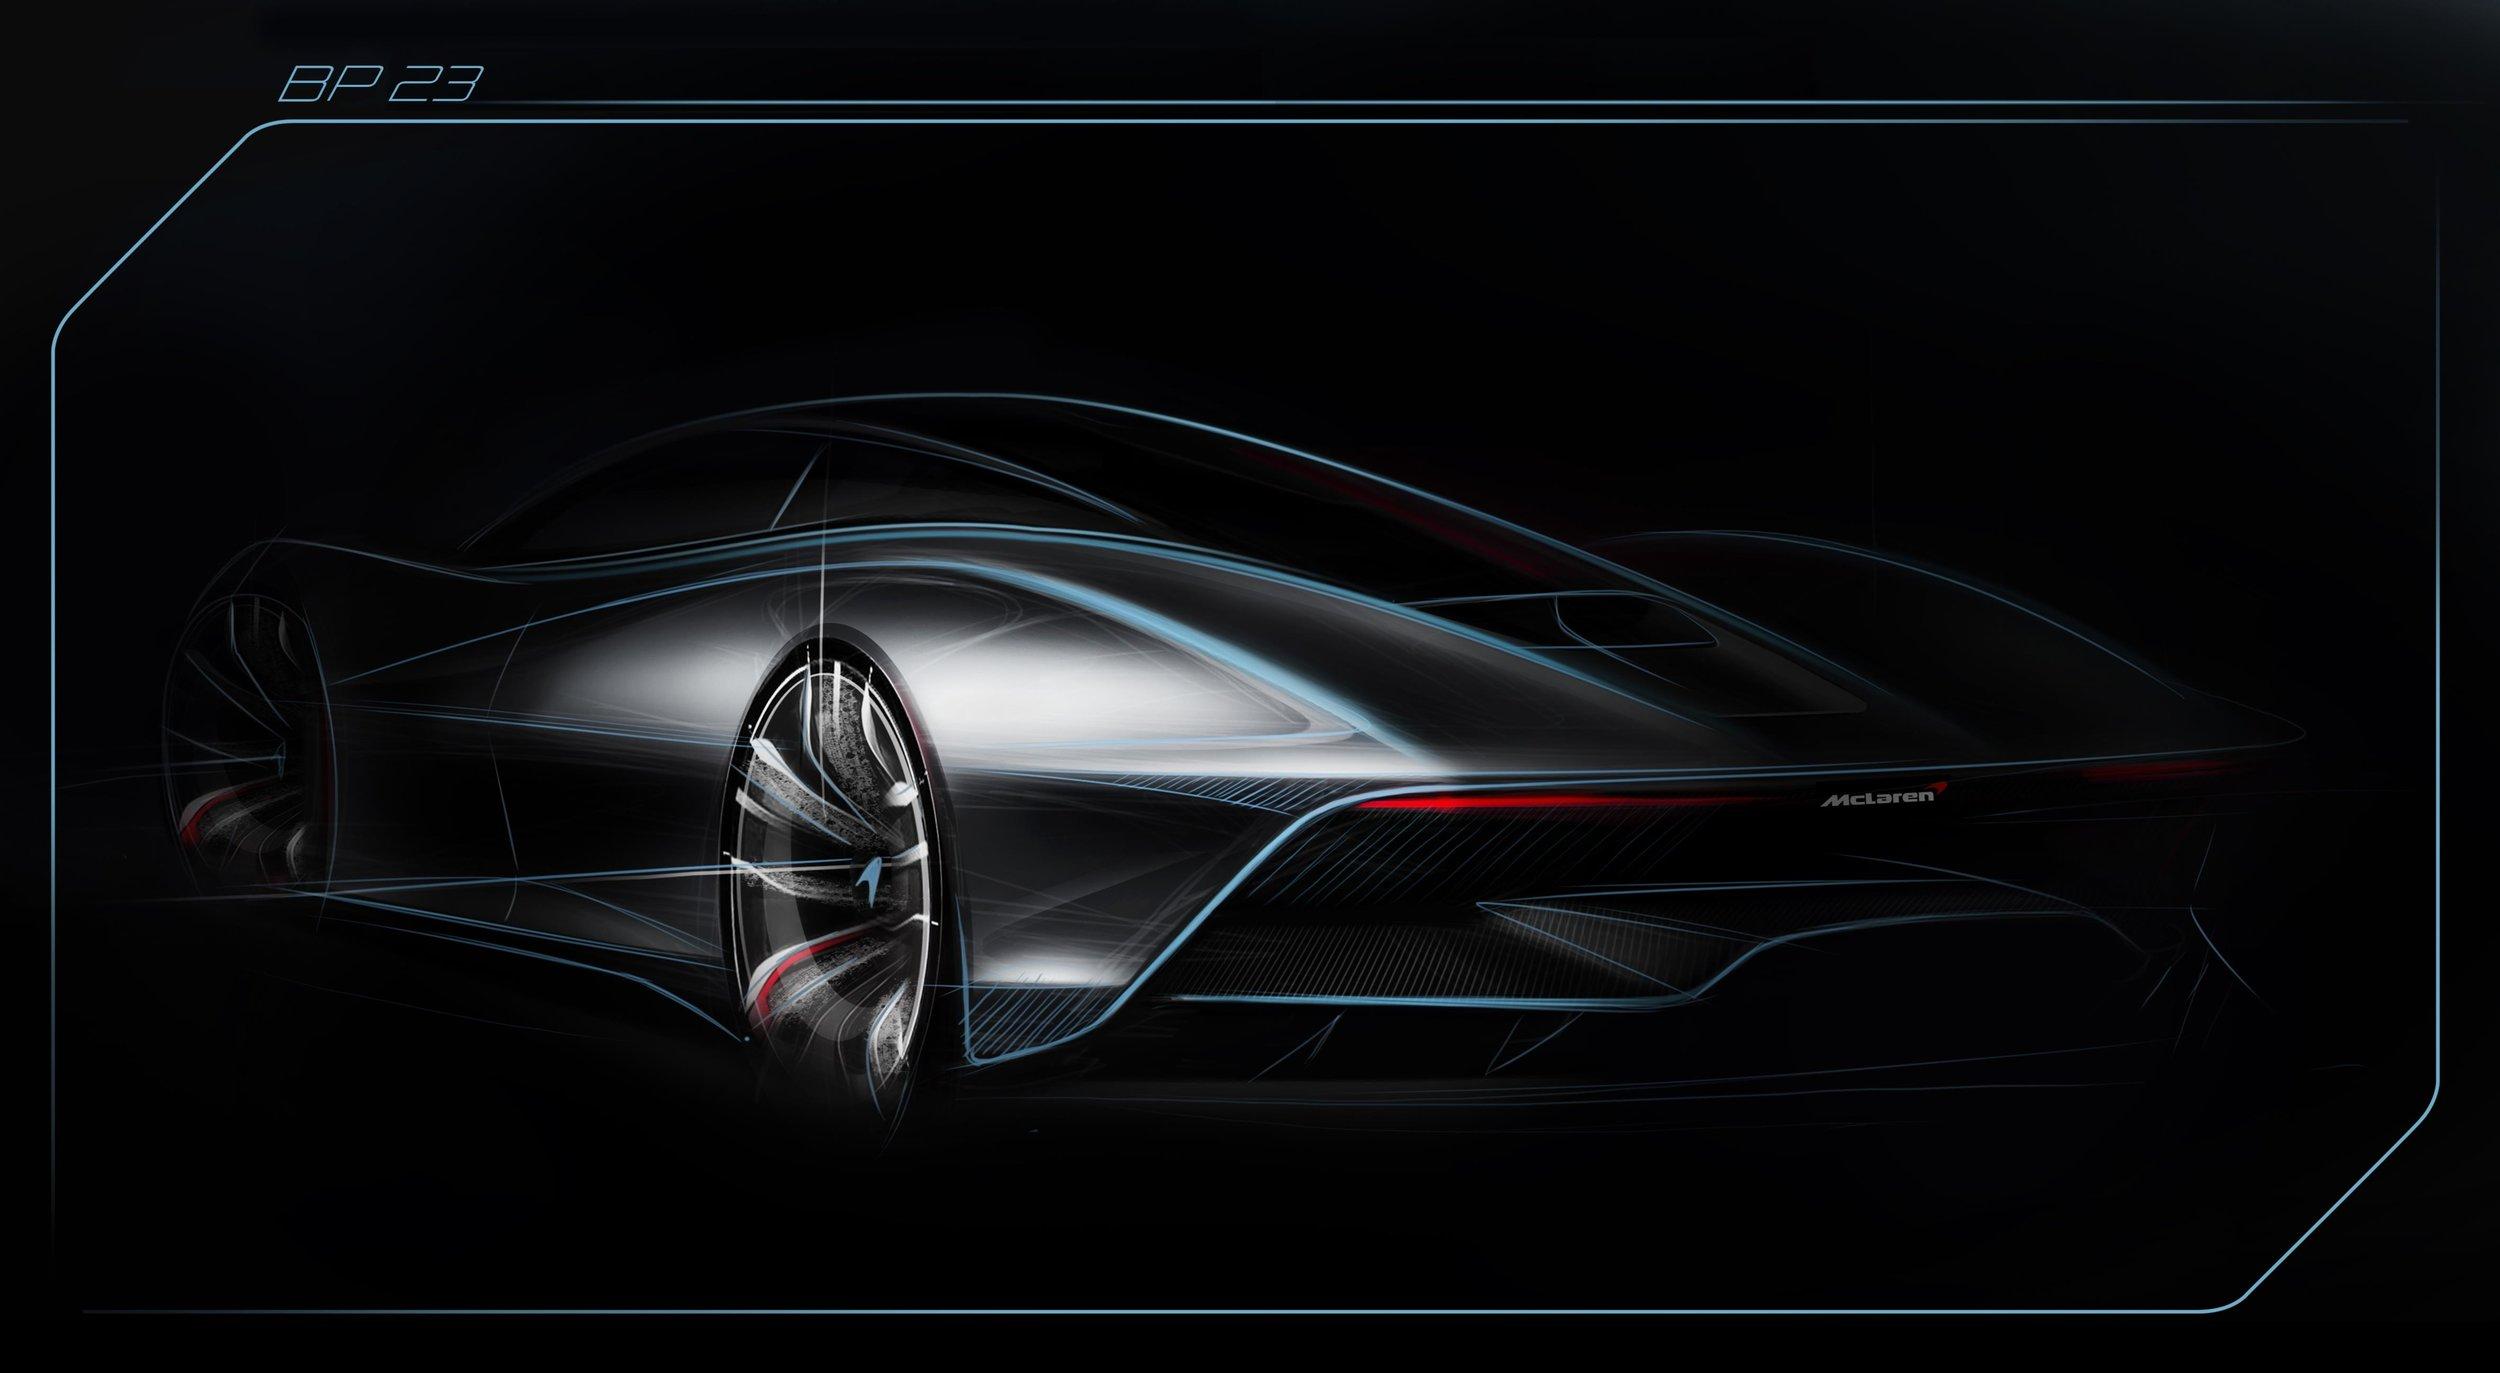 McLaren BP23_March 2018_rear sketch.jpg